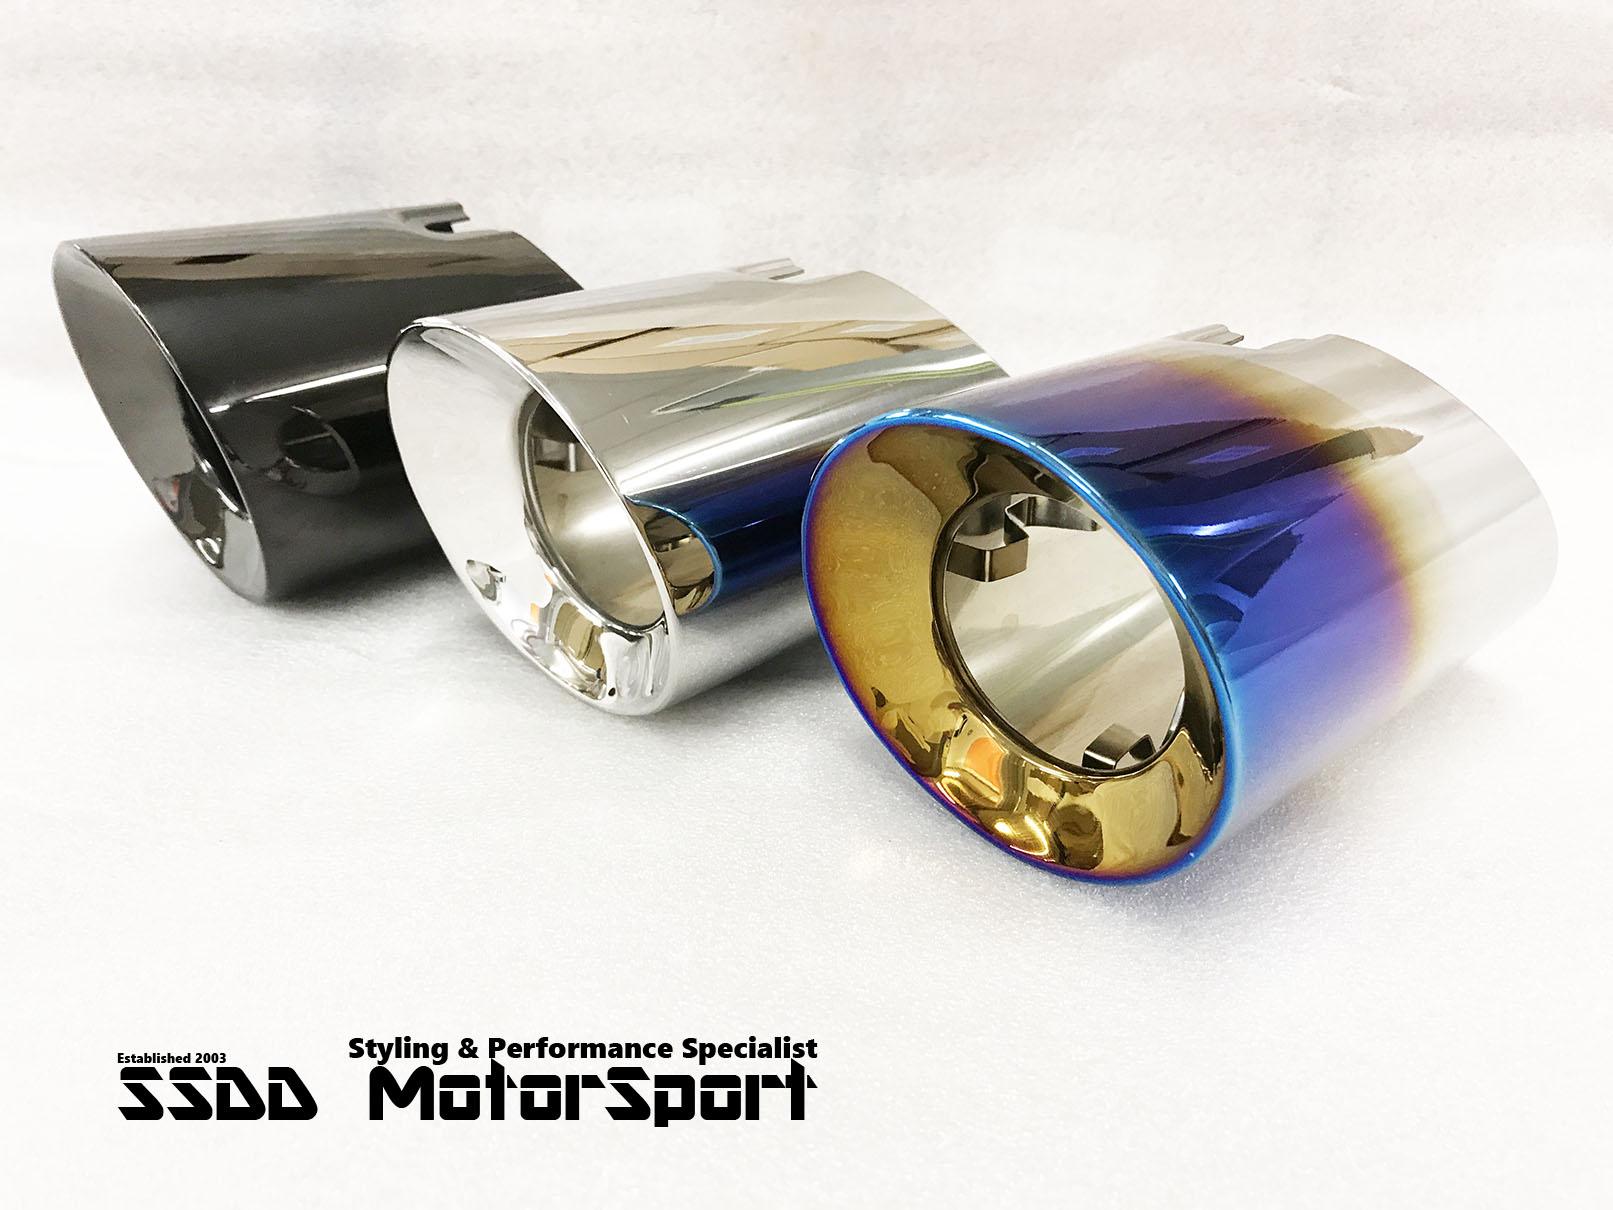 bmw-n55-b58-slip-on-exhaust-tips-m135i-m140i-m235i-m240i-335i-340i-435i-440i.jpg